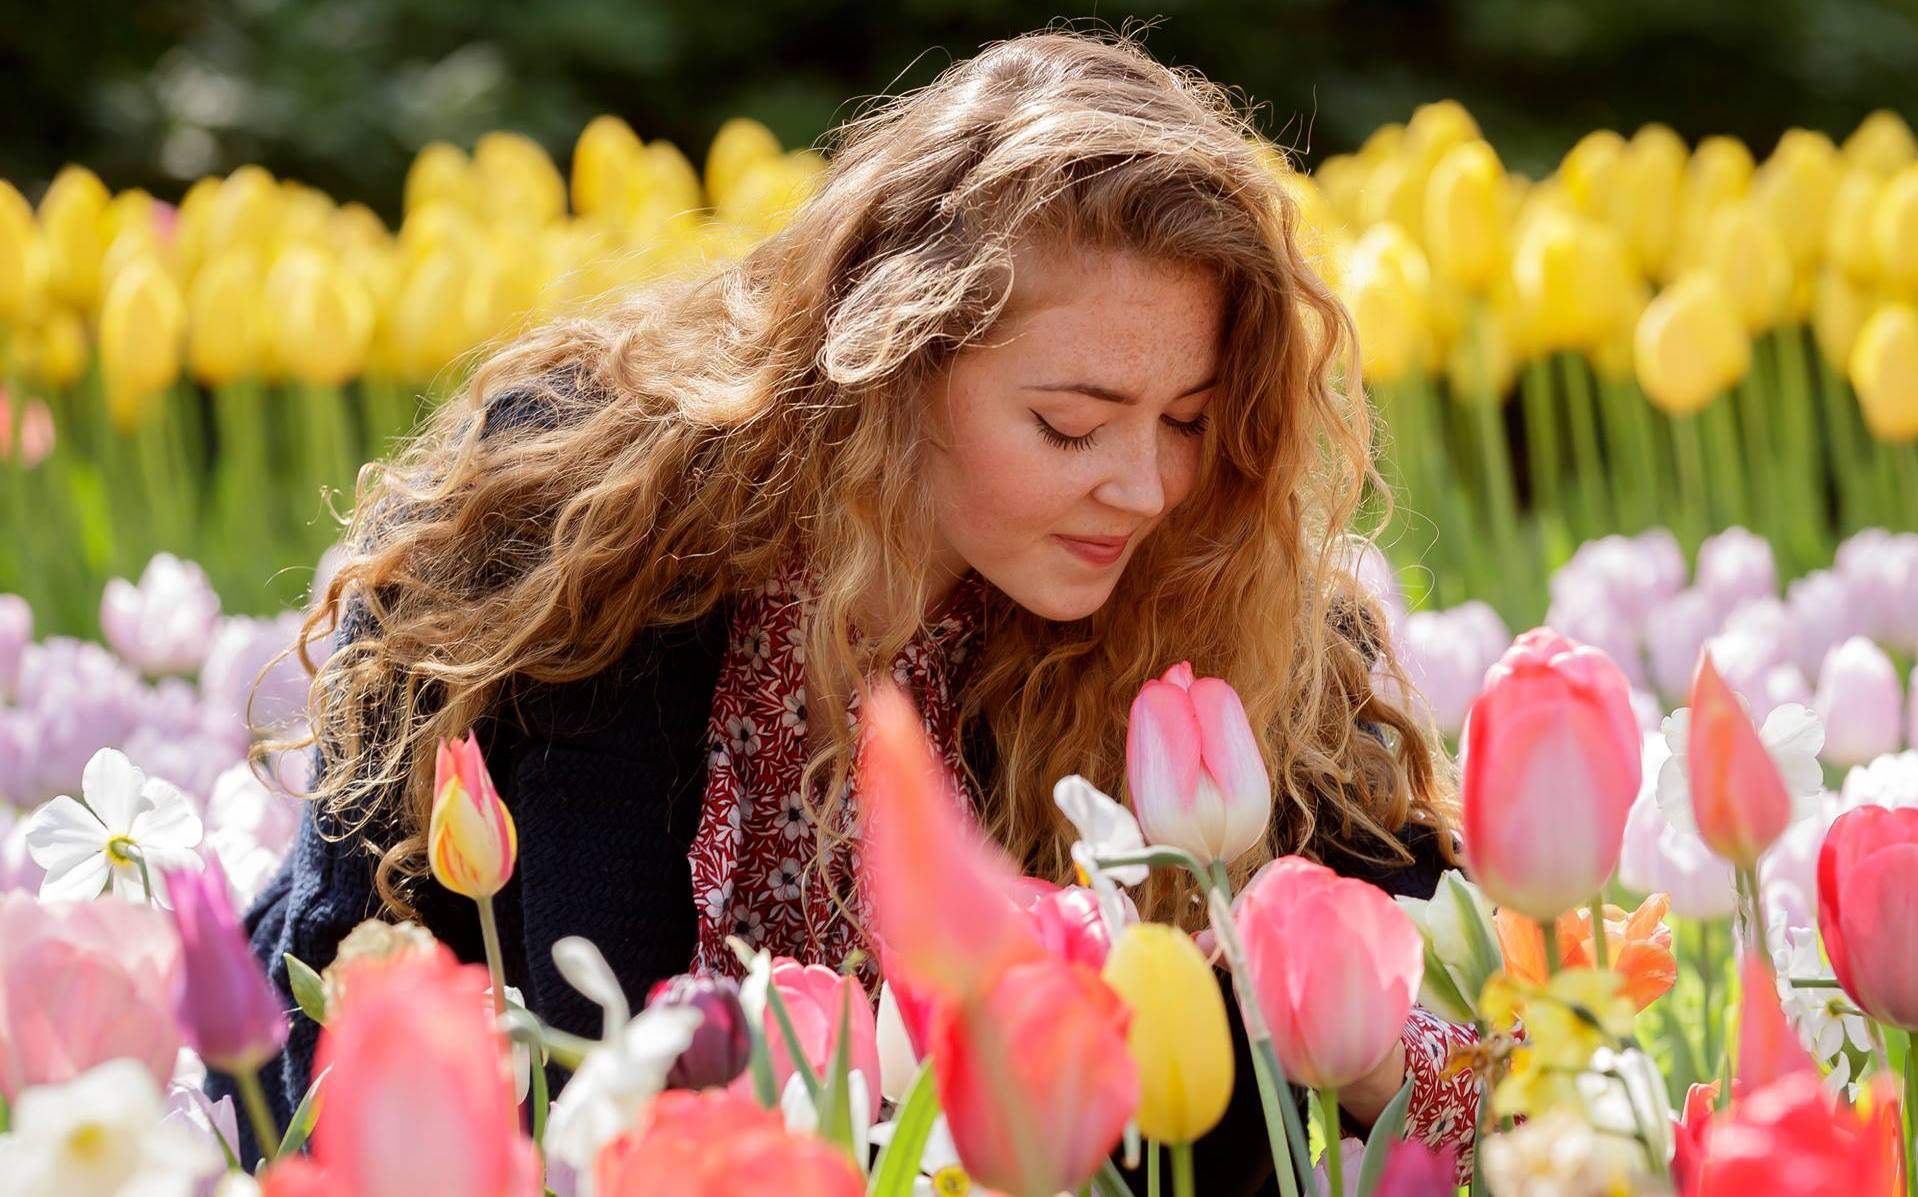 Millones de tulipanes visten a Holanda de primavera